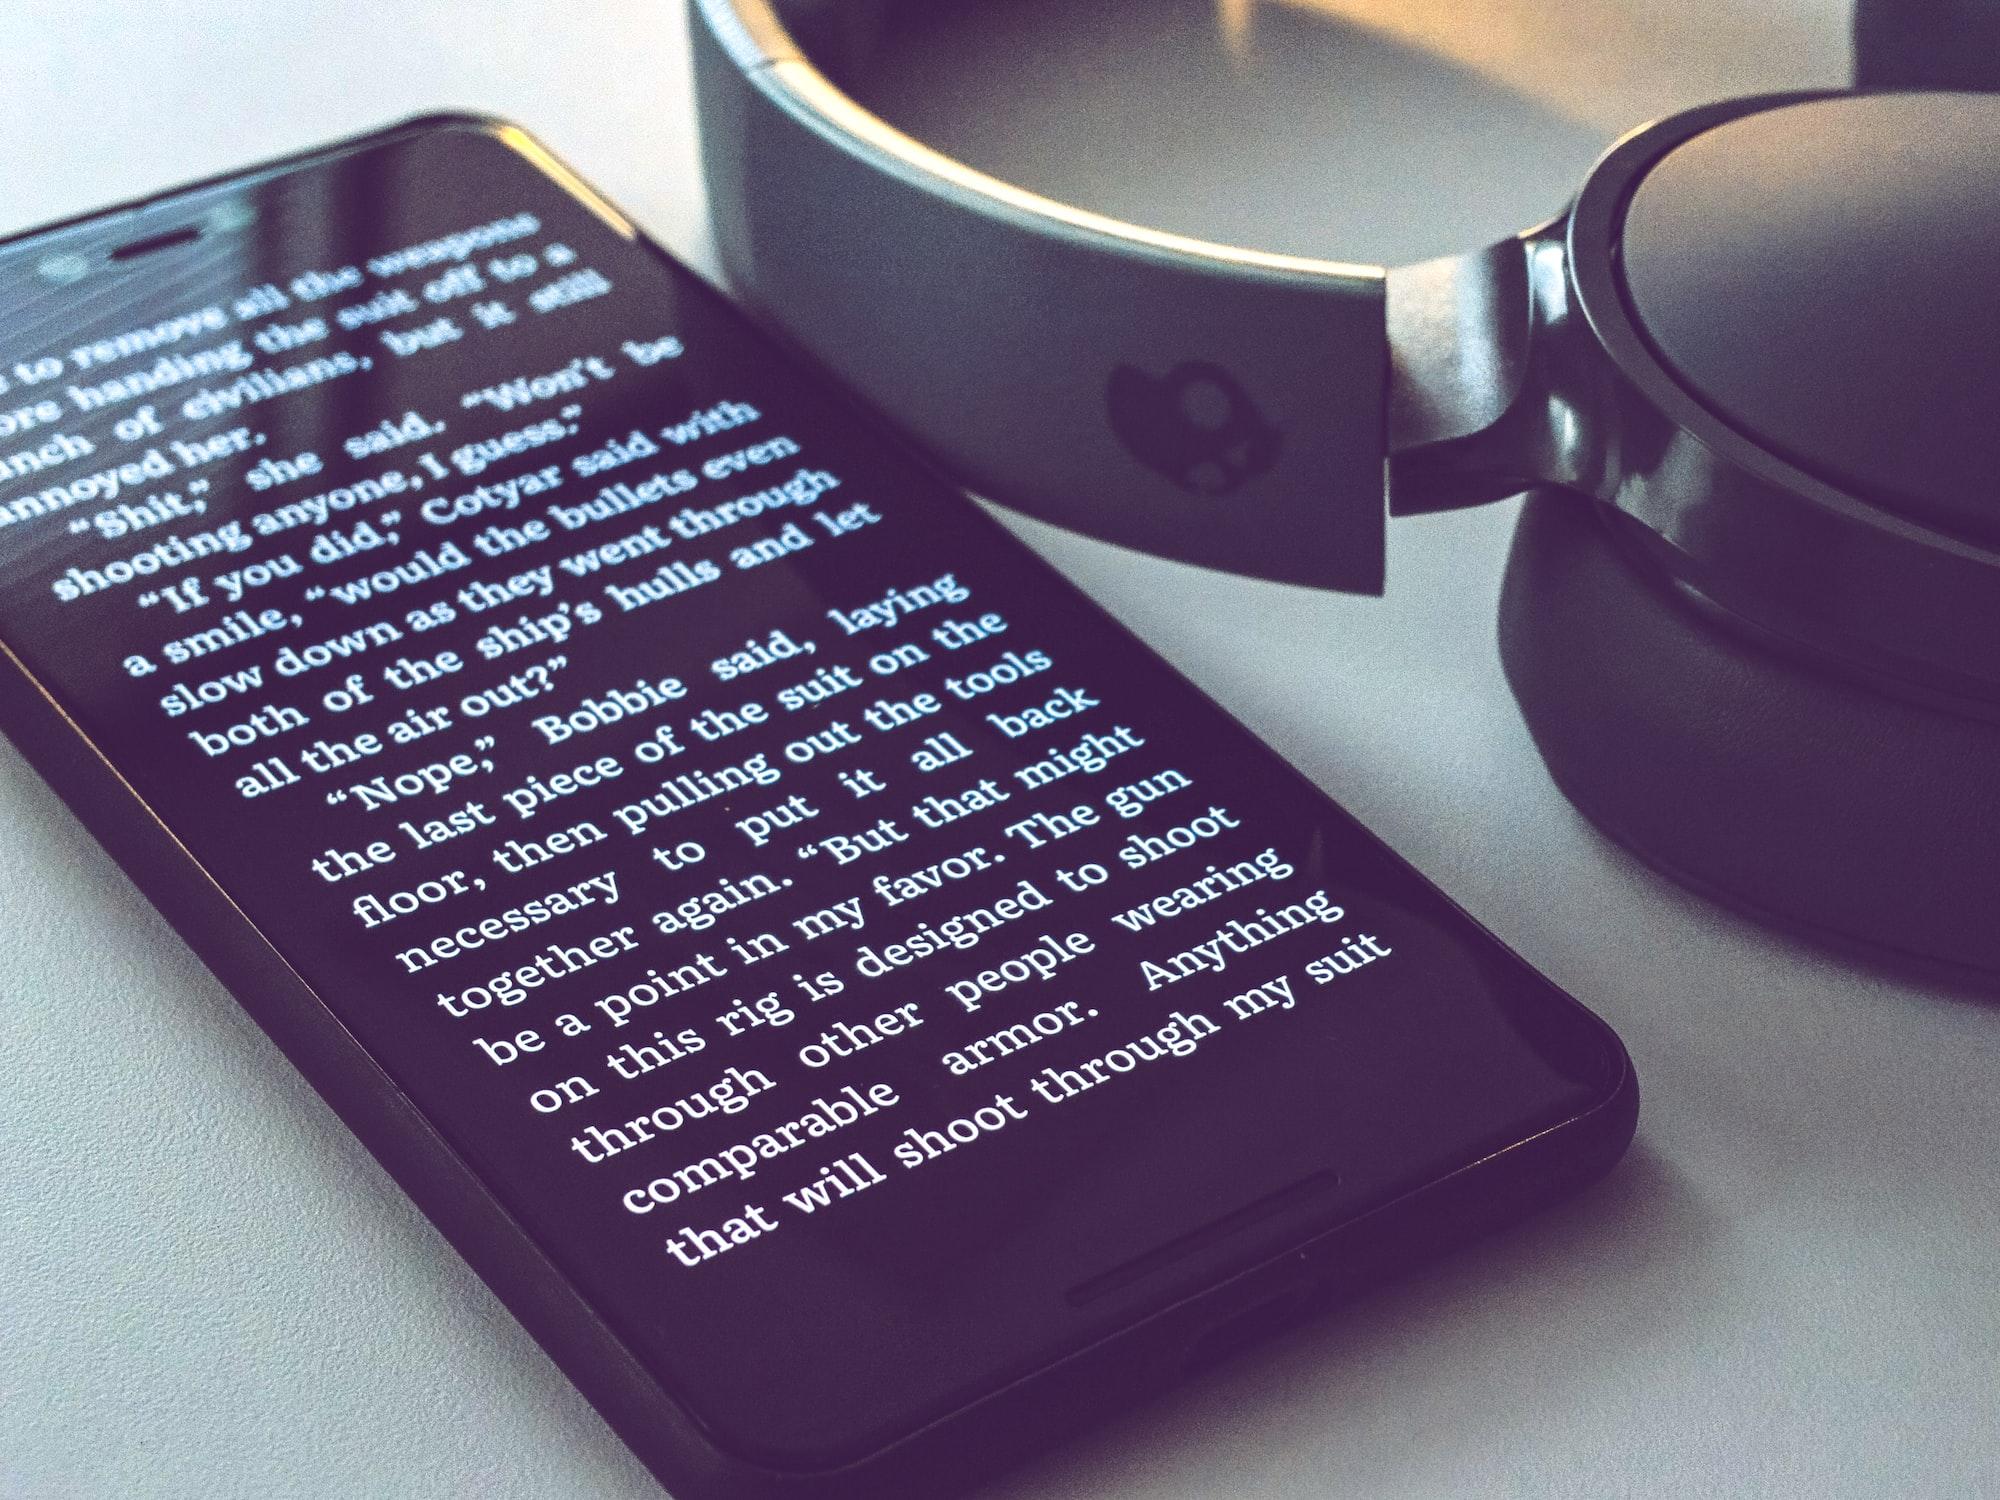 Nexus 5x - Familiar feel, sameresult